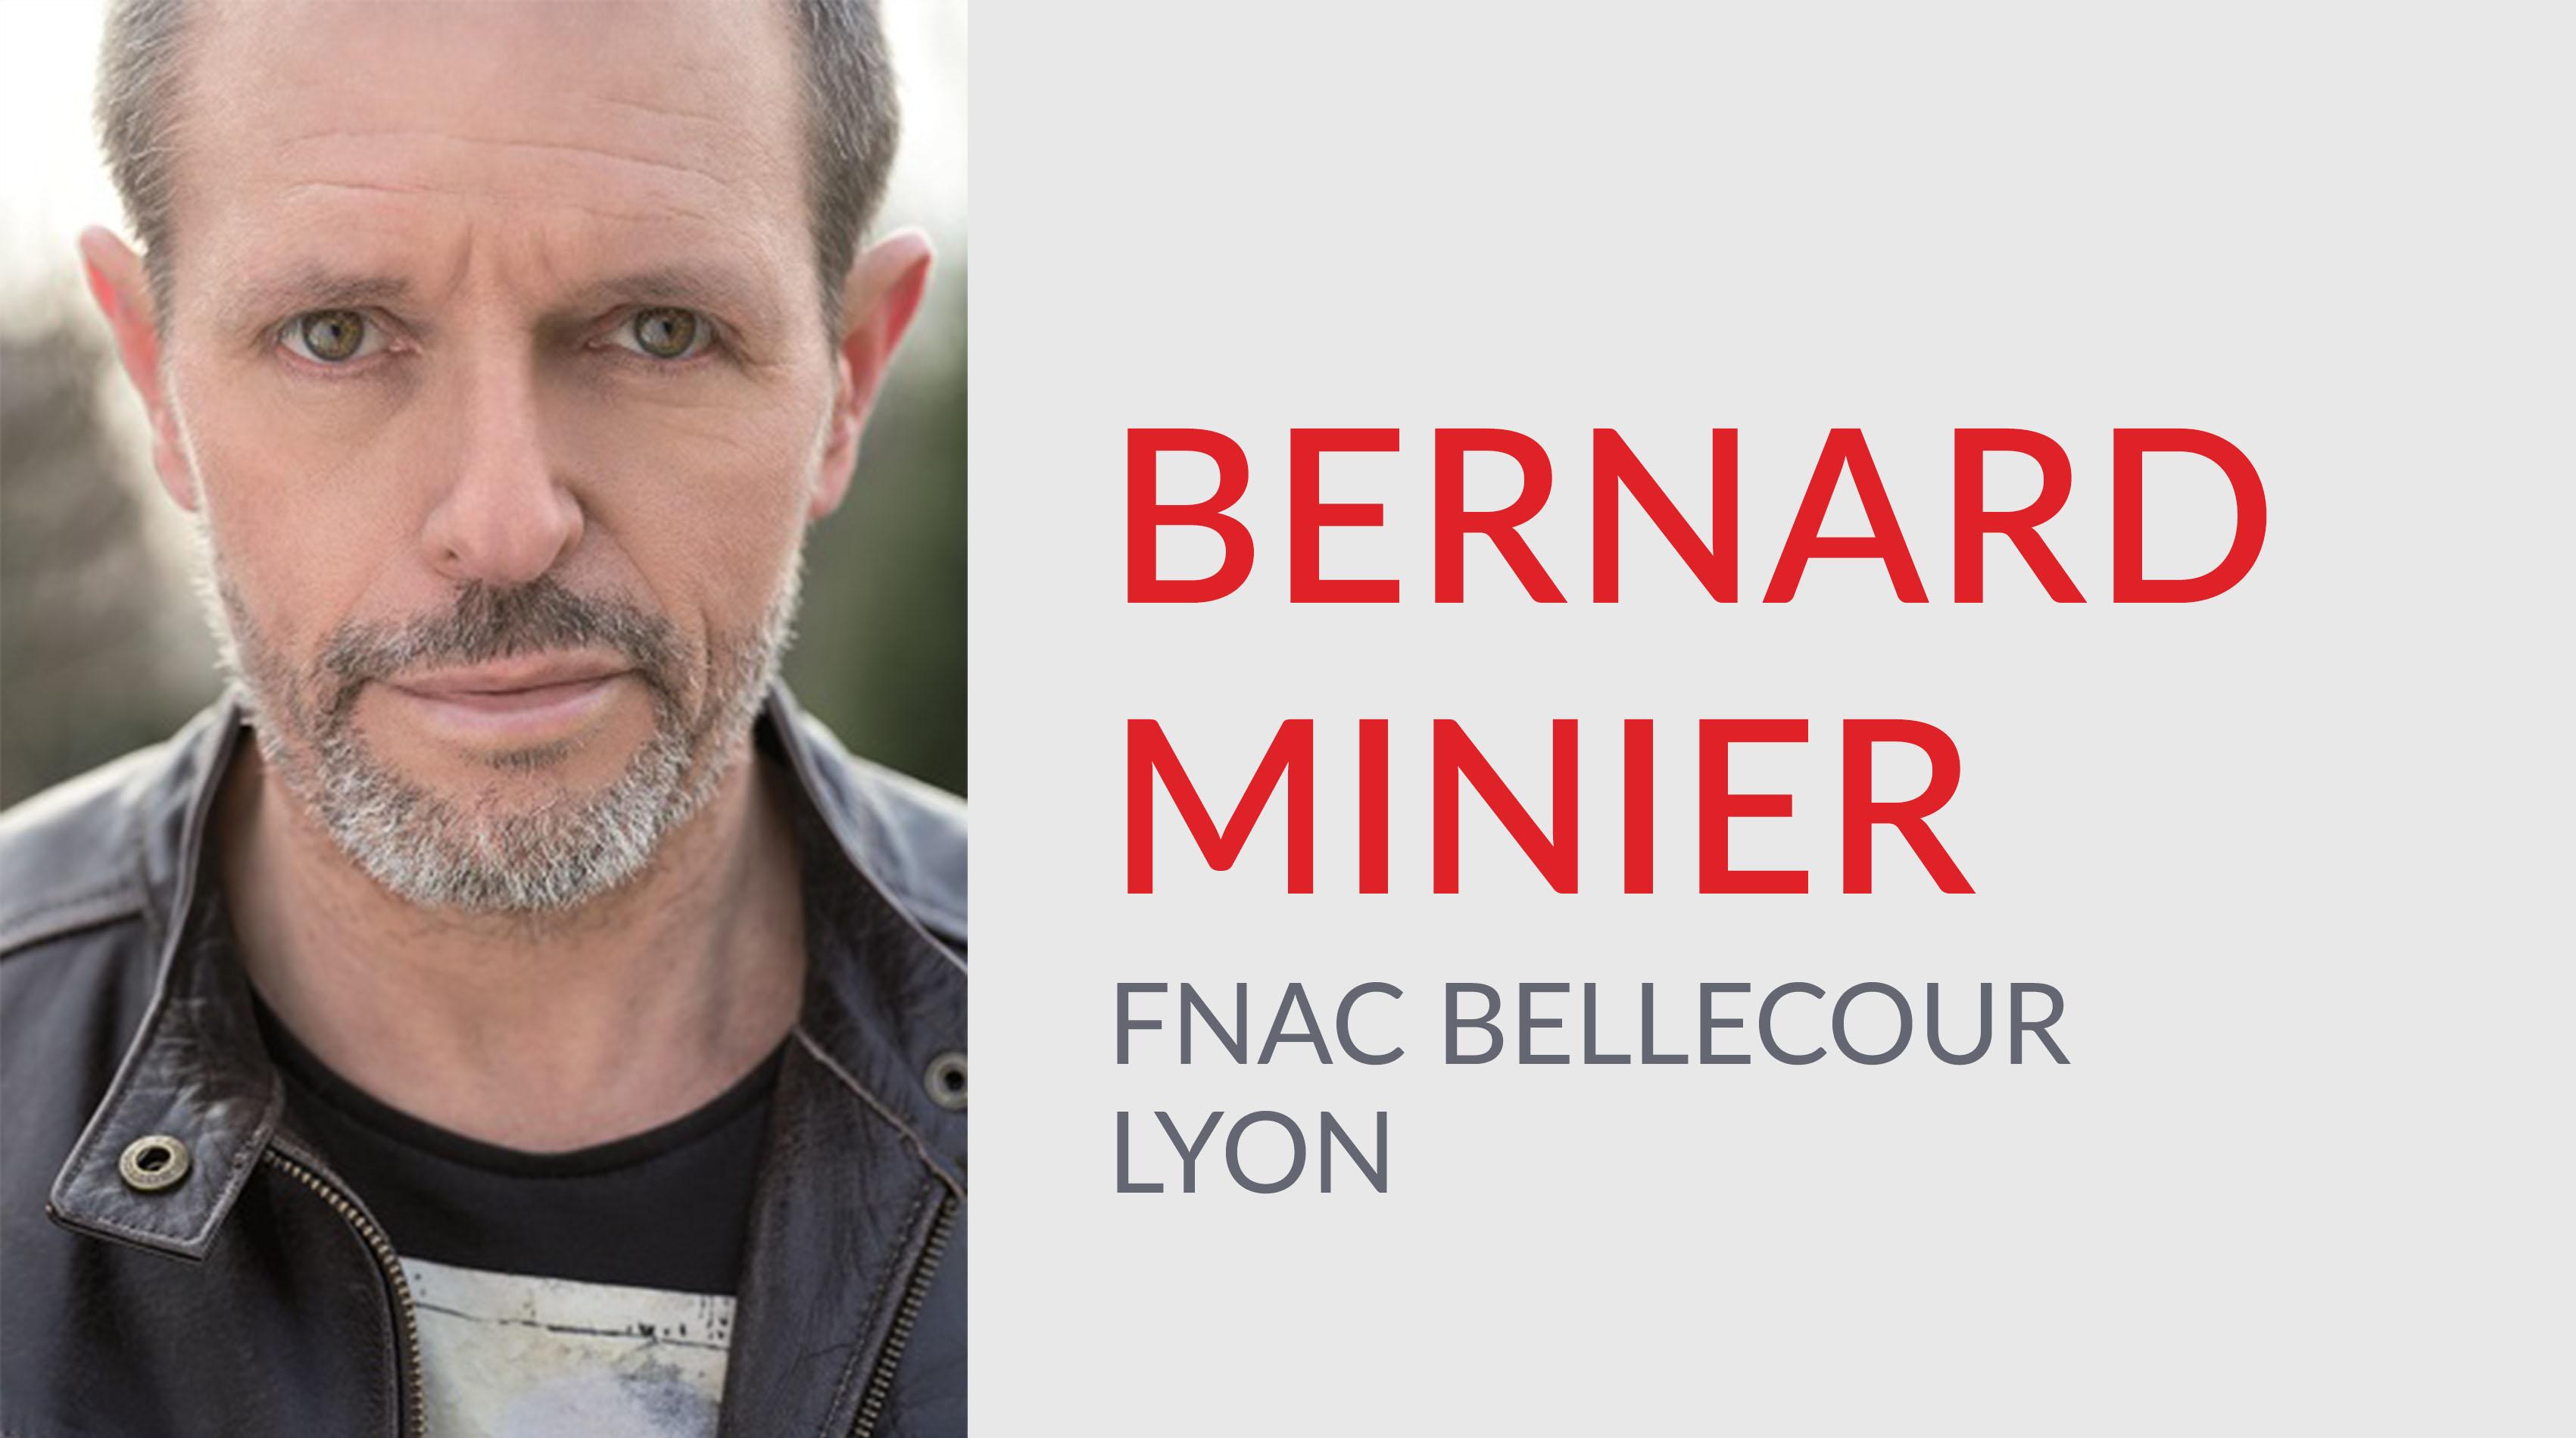 RENCONTRE AVEC BERNARD MINIER À LA FNAC LYON BELLCOUR